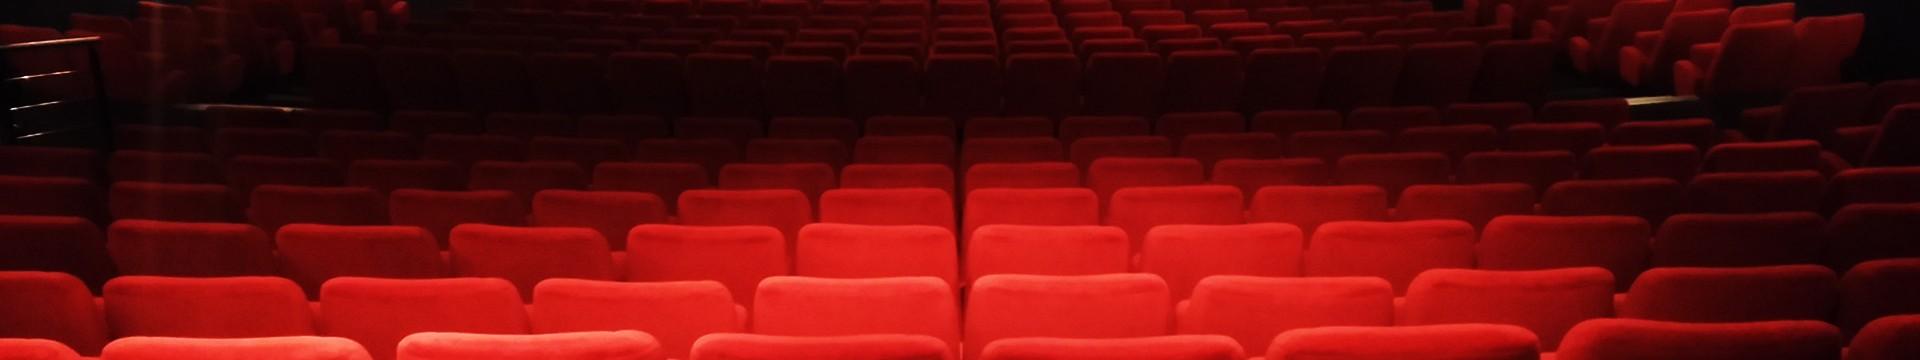 cinema-01-8957